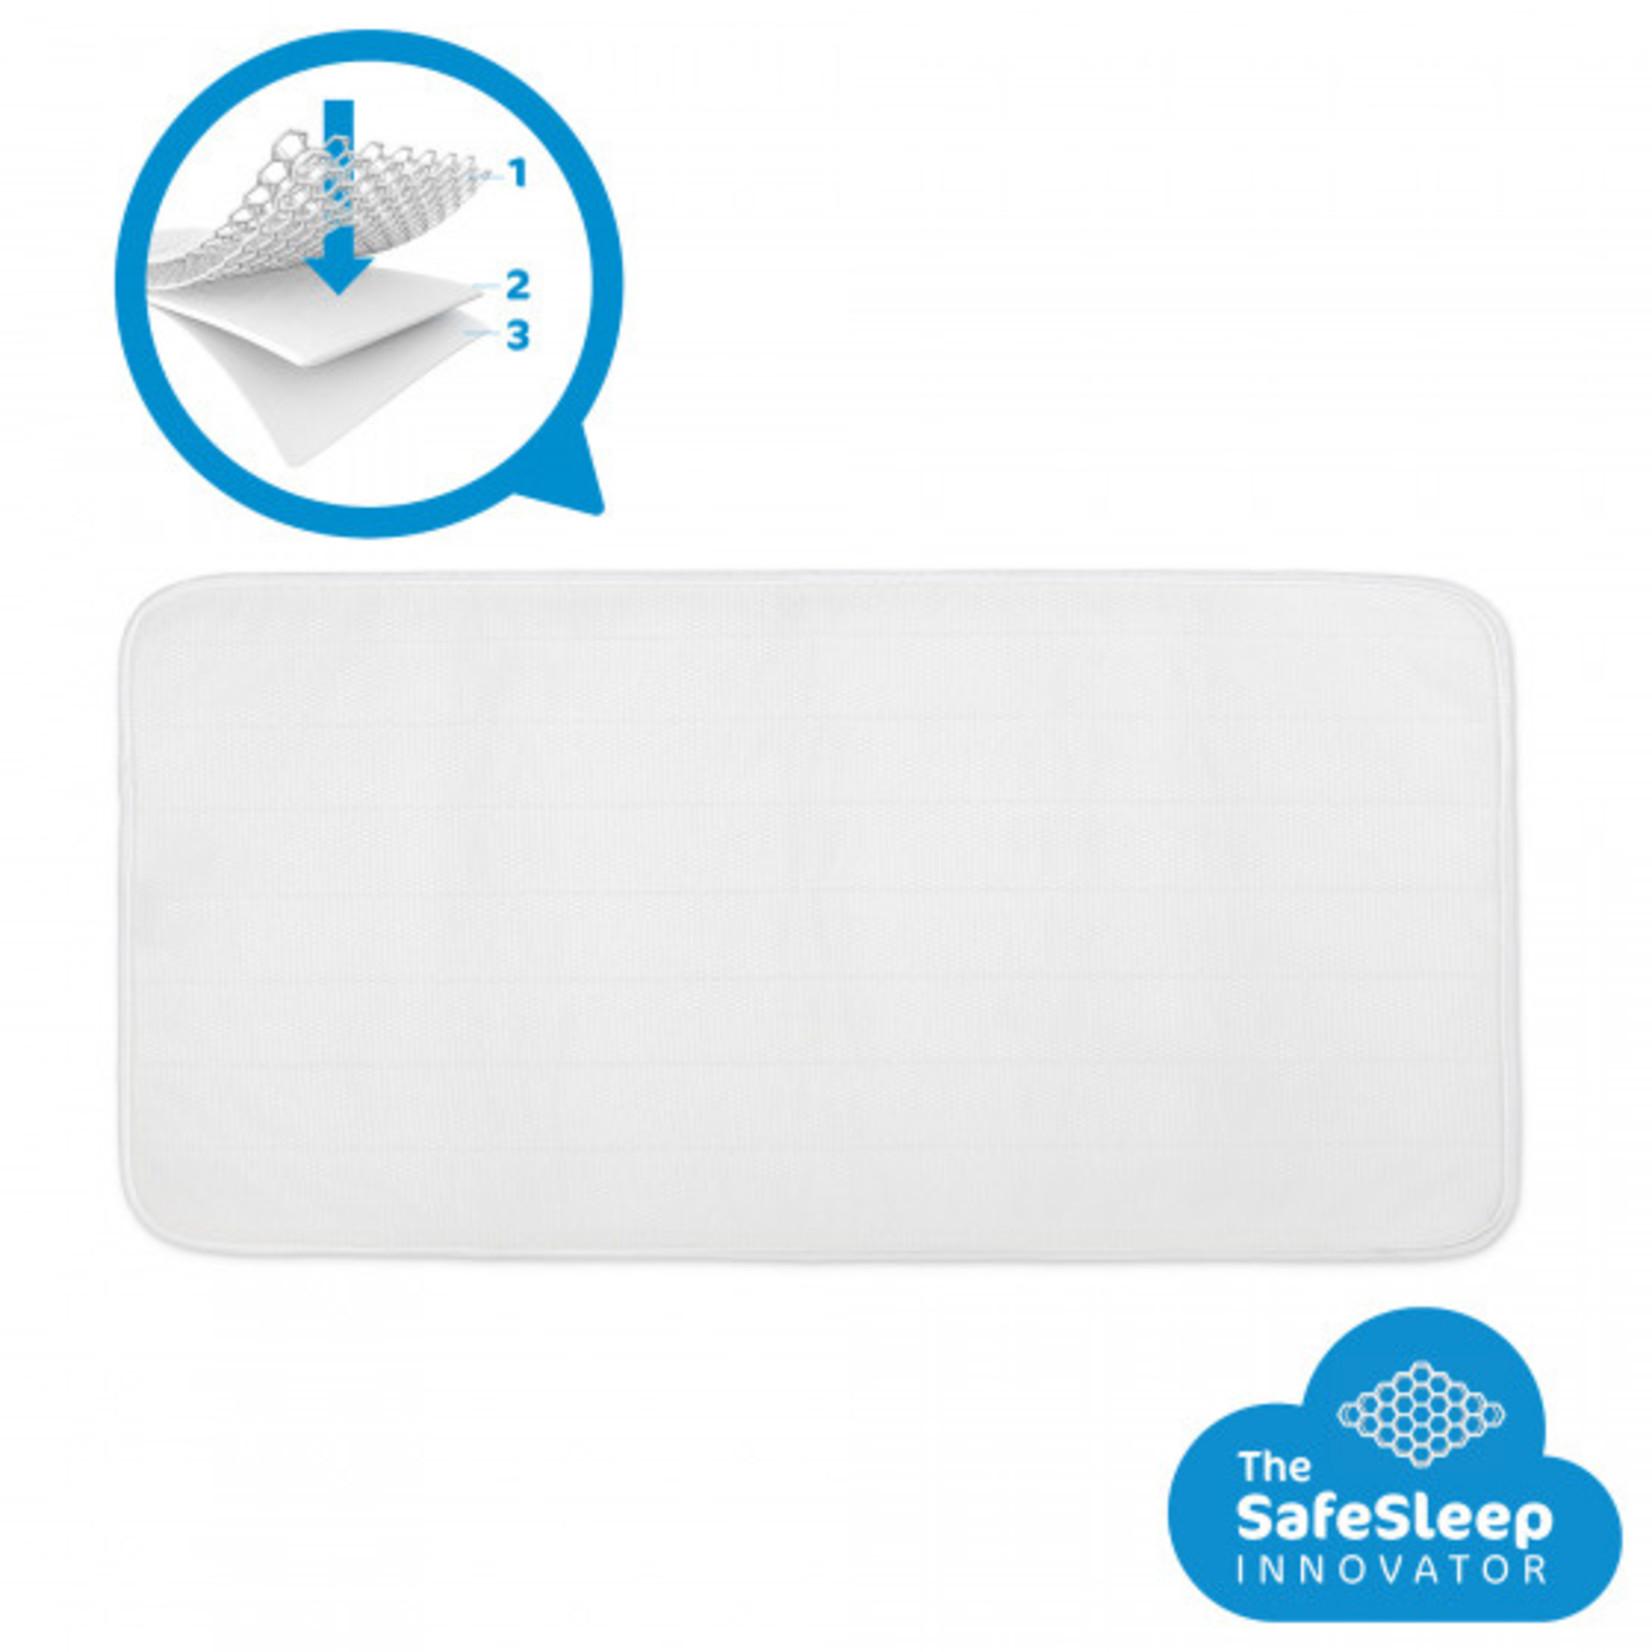 Aerosleep Aerosleep Sleepsafe 3D Beschermer 60x120cm